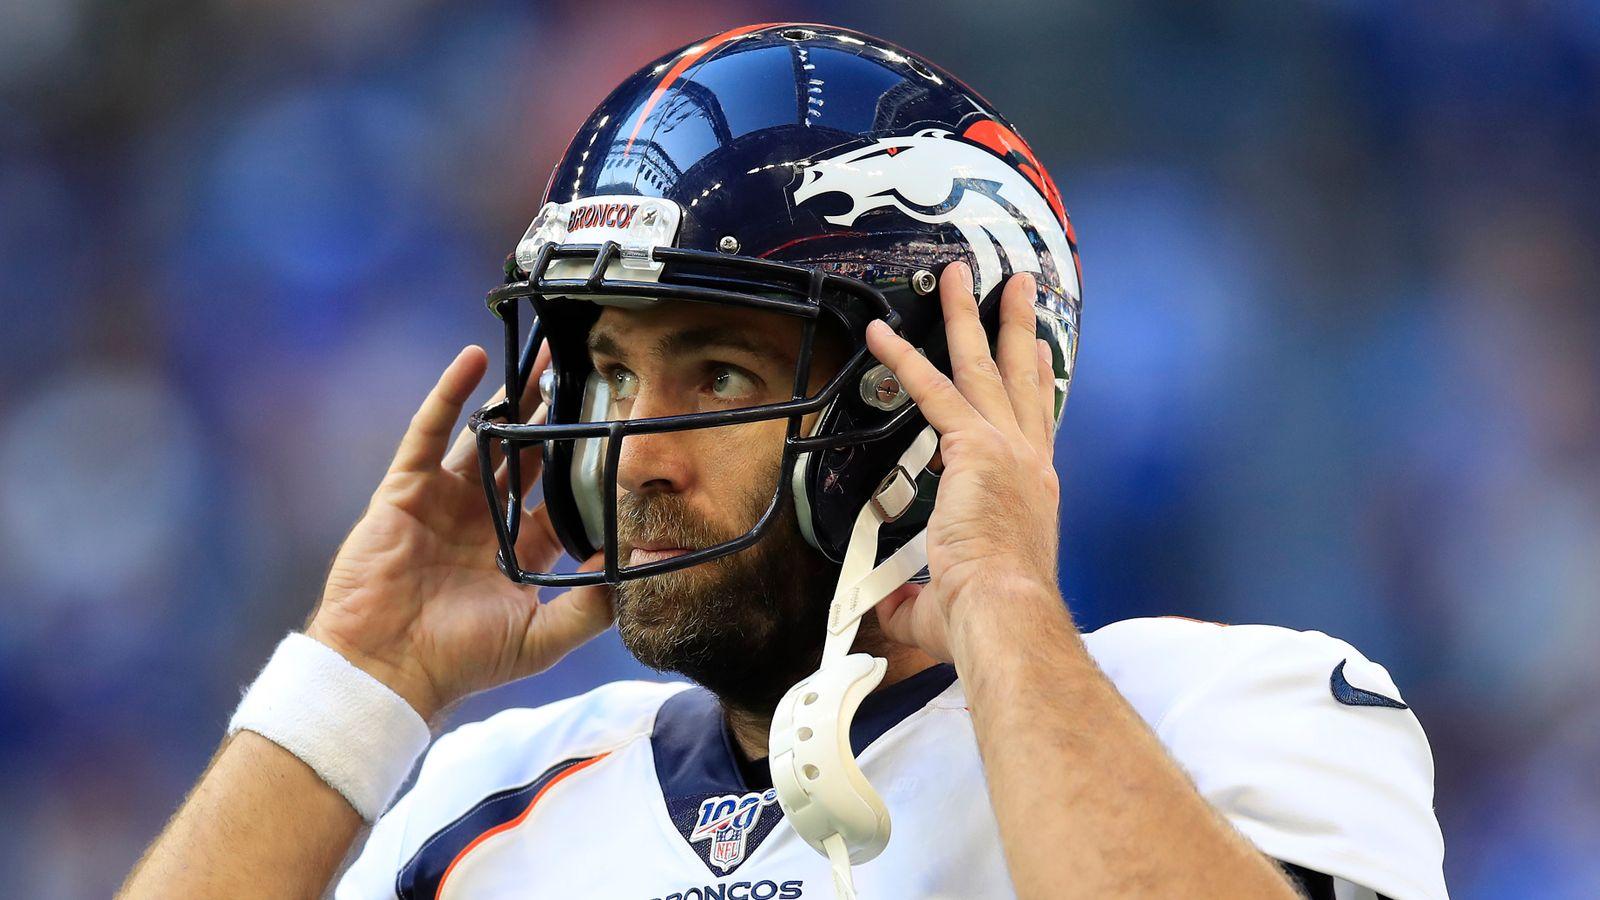 Denver Broncos quarterback Joe Flacco plans to play on in 2020